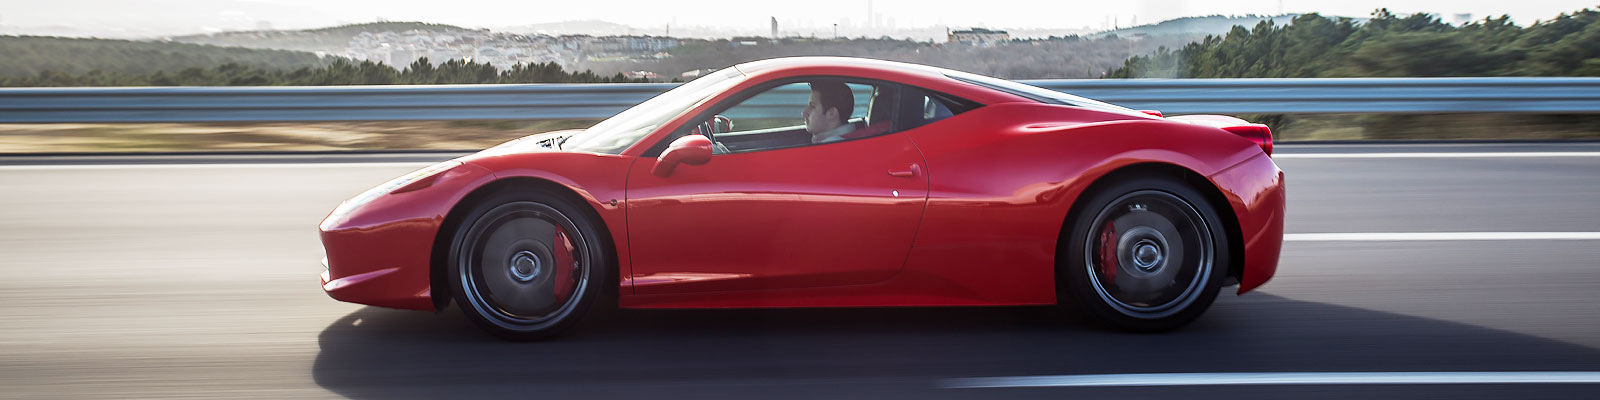 Ferrari Driving Experiences